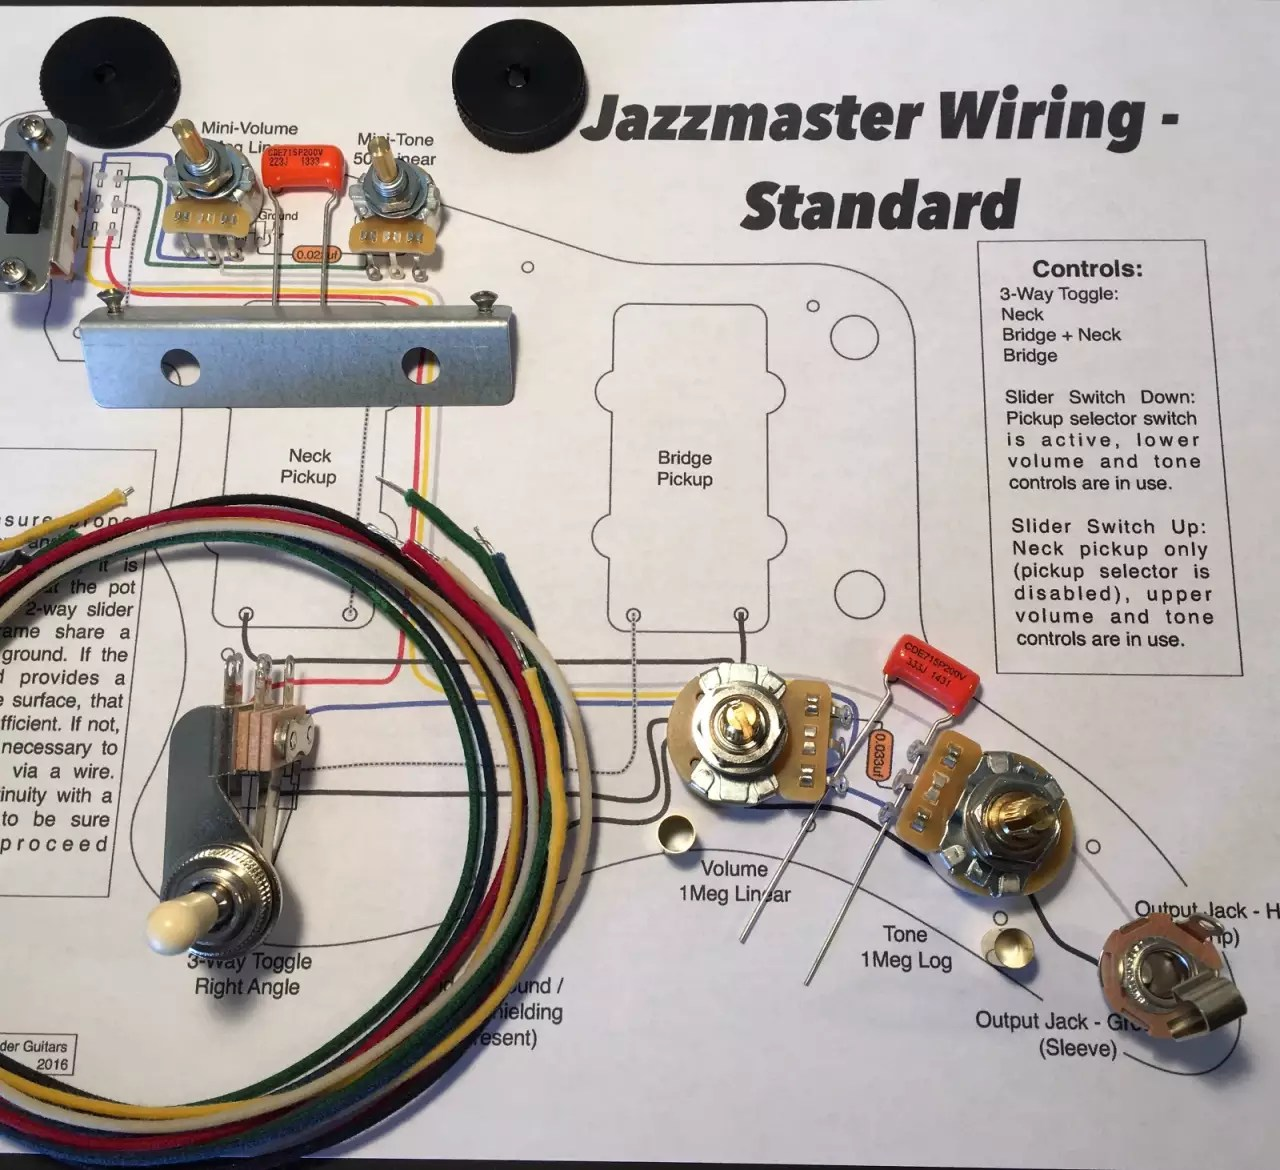 Wiring Diagrams Fender Jazzmaster Wiring Diagram Jazzmaster Wiring